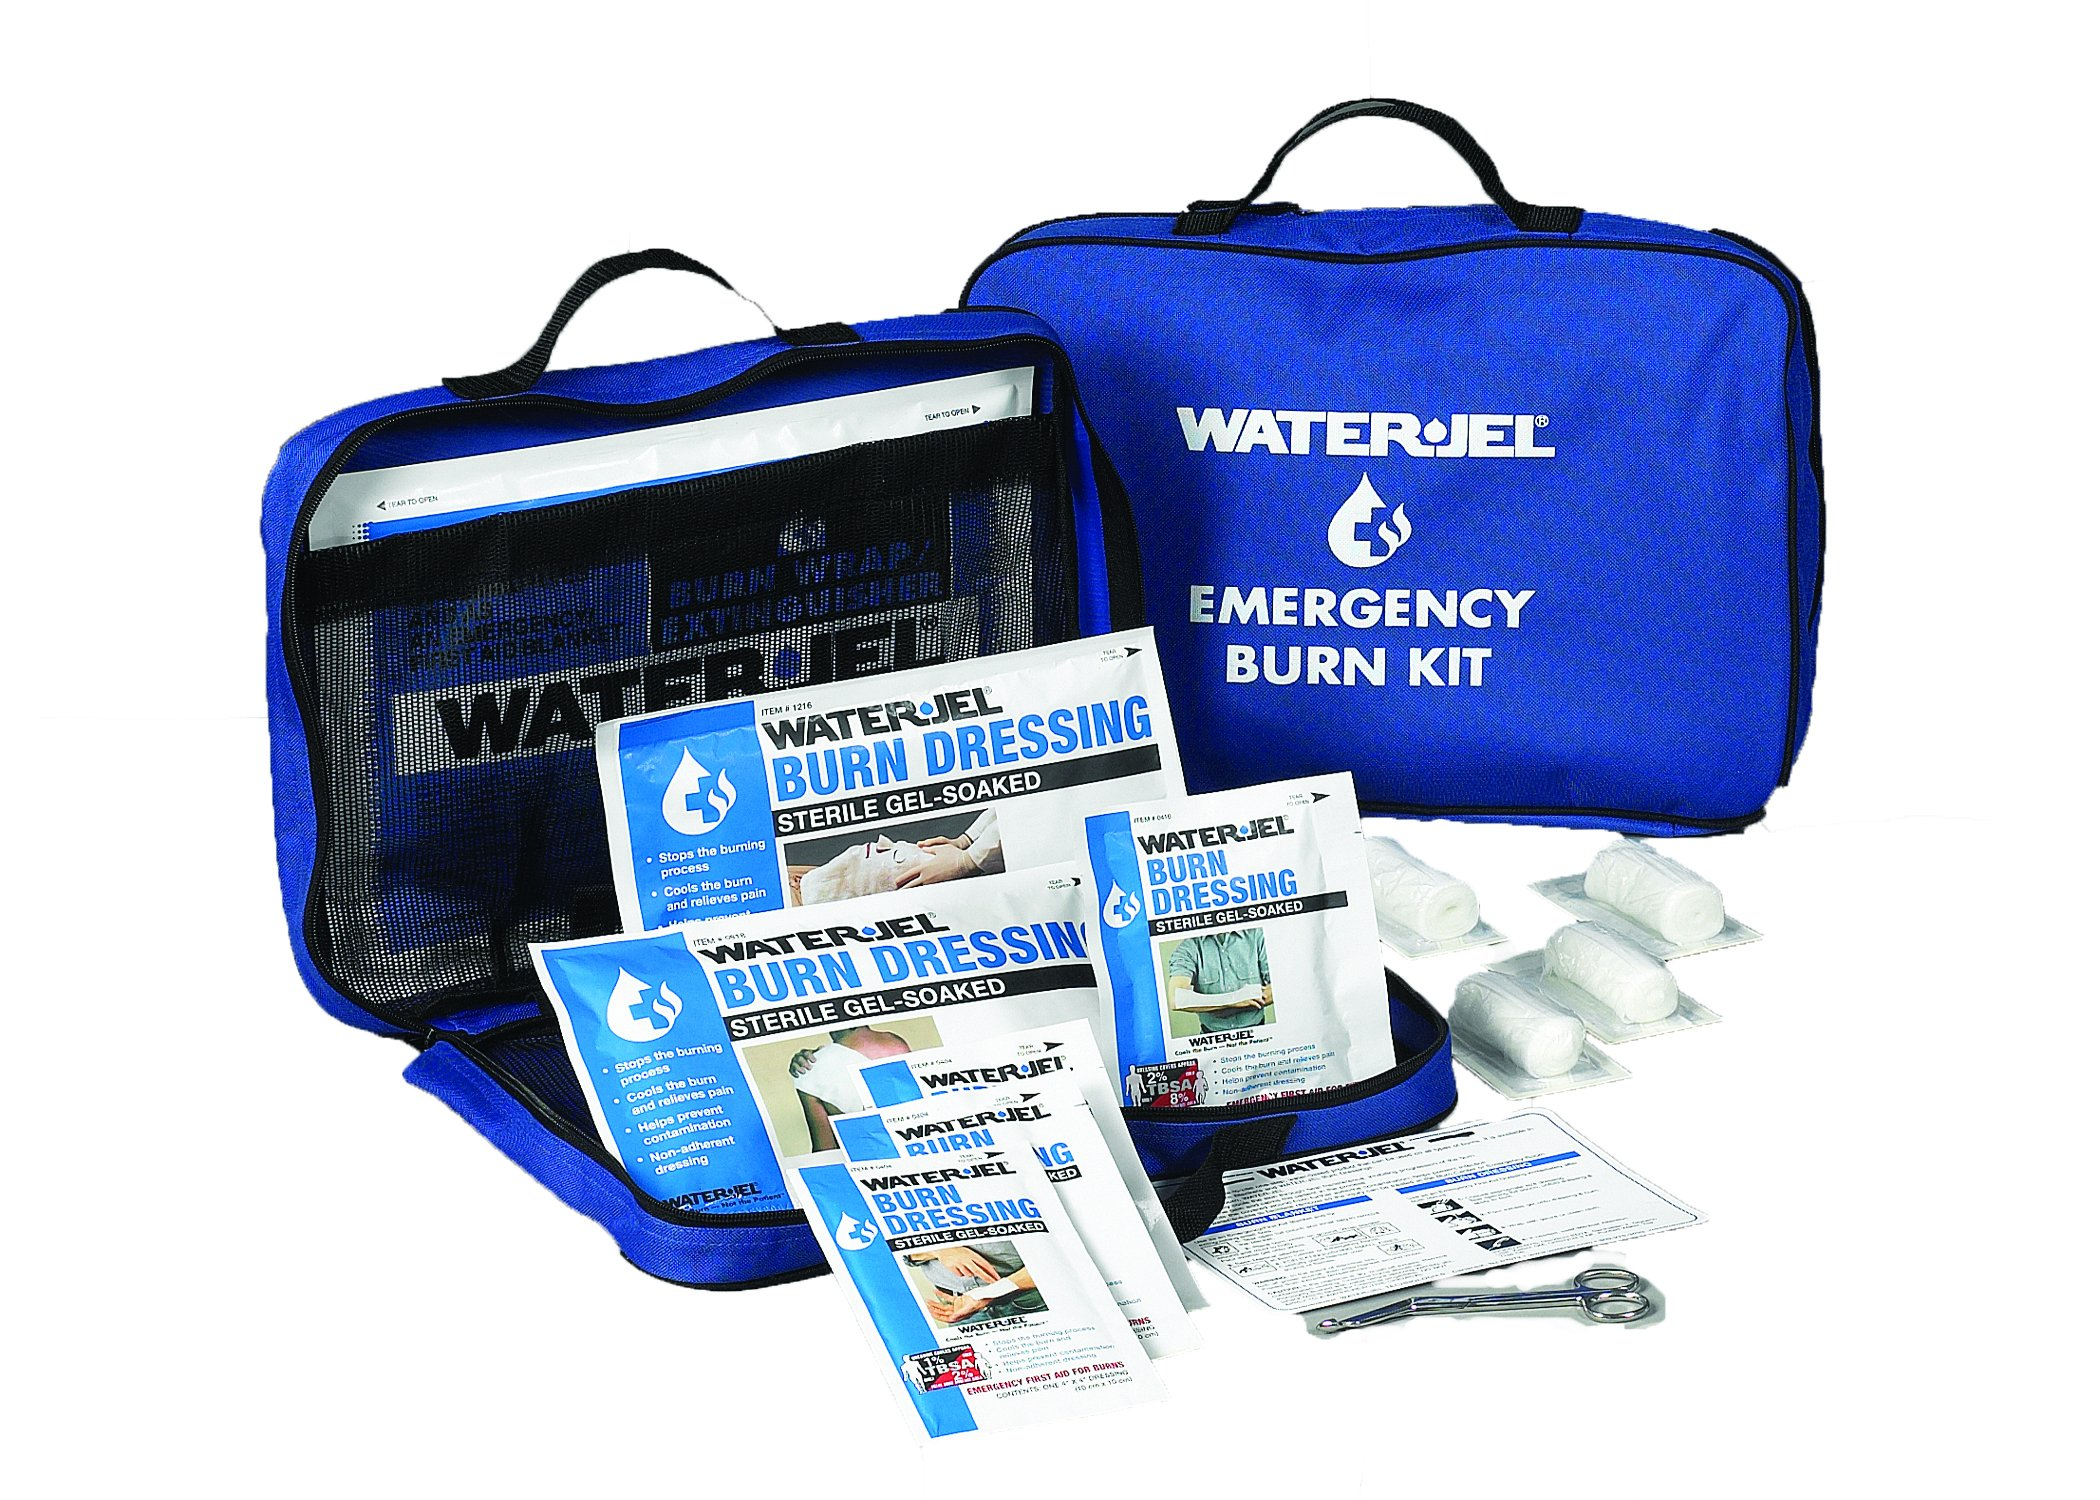 Medique Products 86601 Water Jel Large Soft Sided Burn Kit, Filled